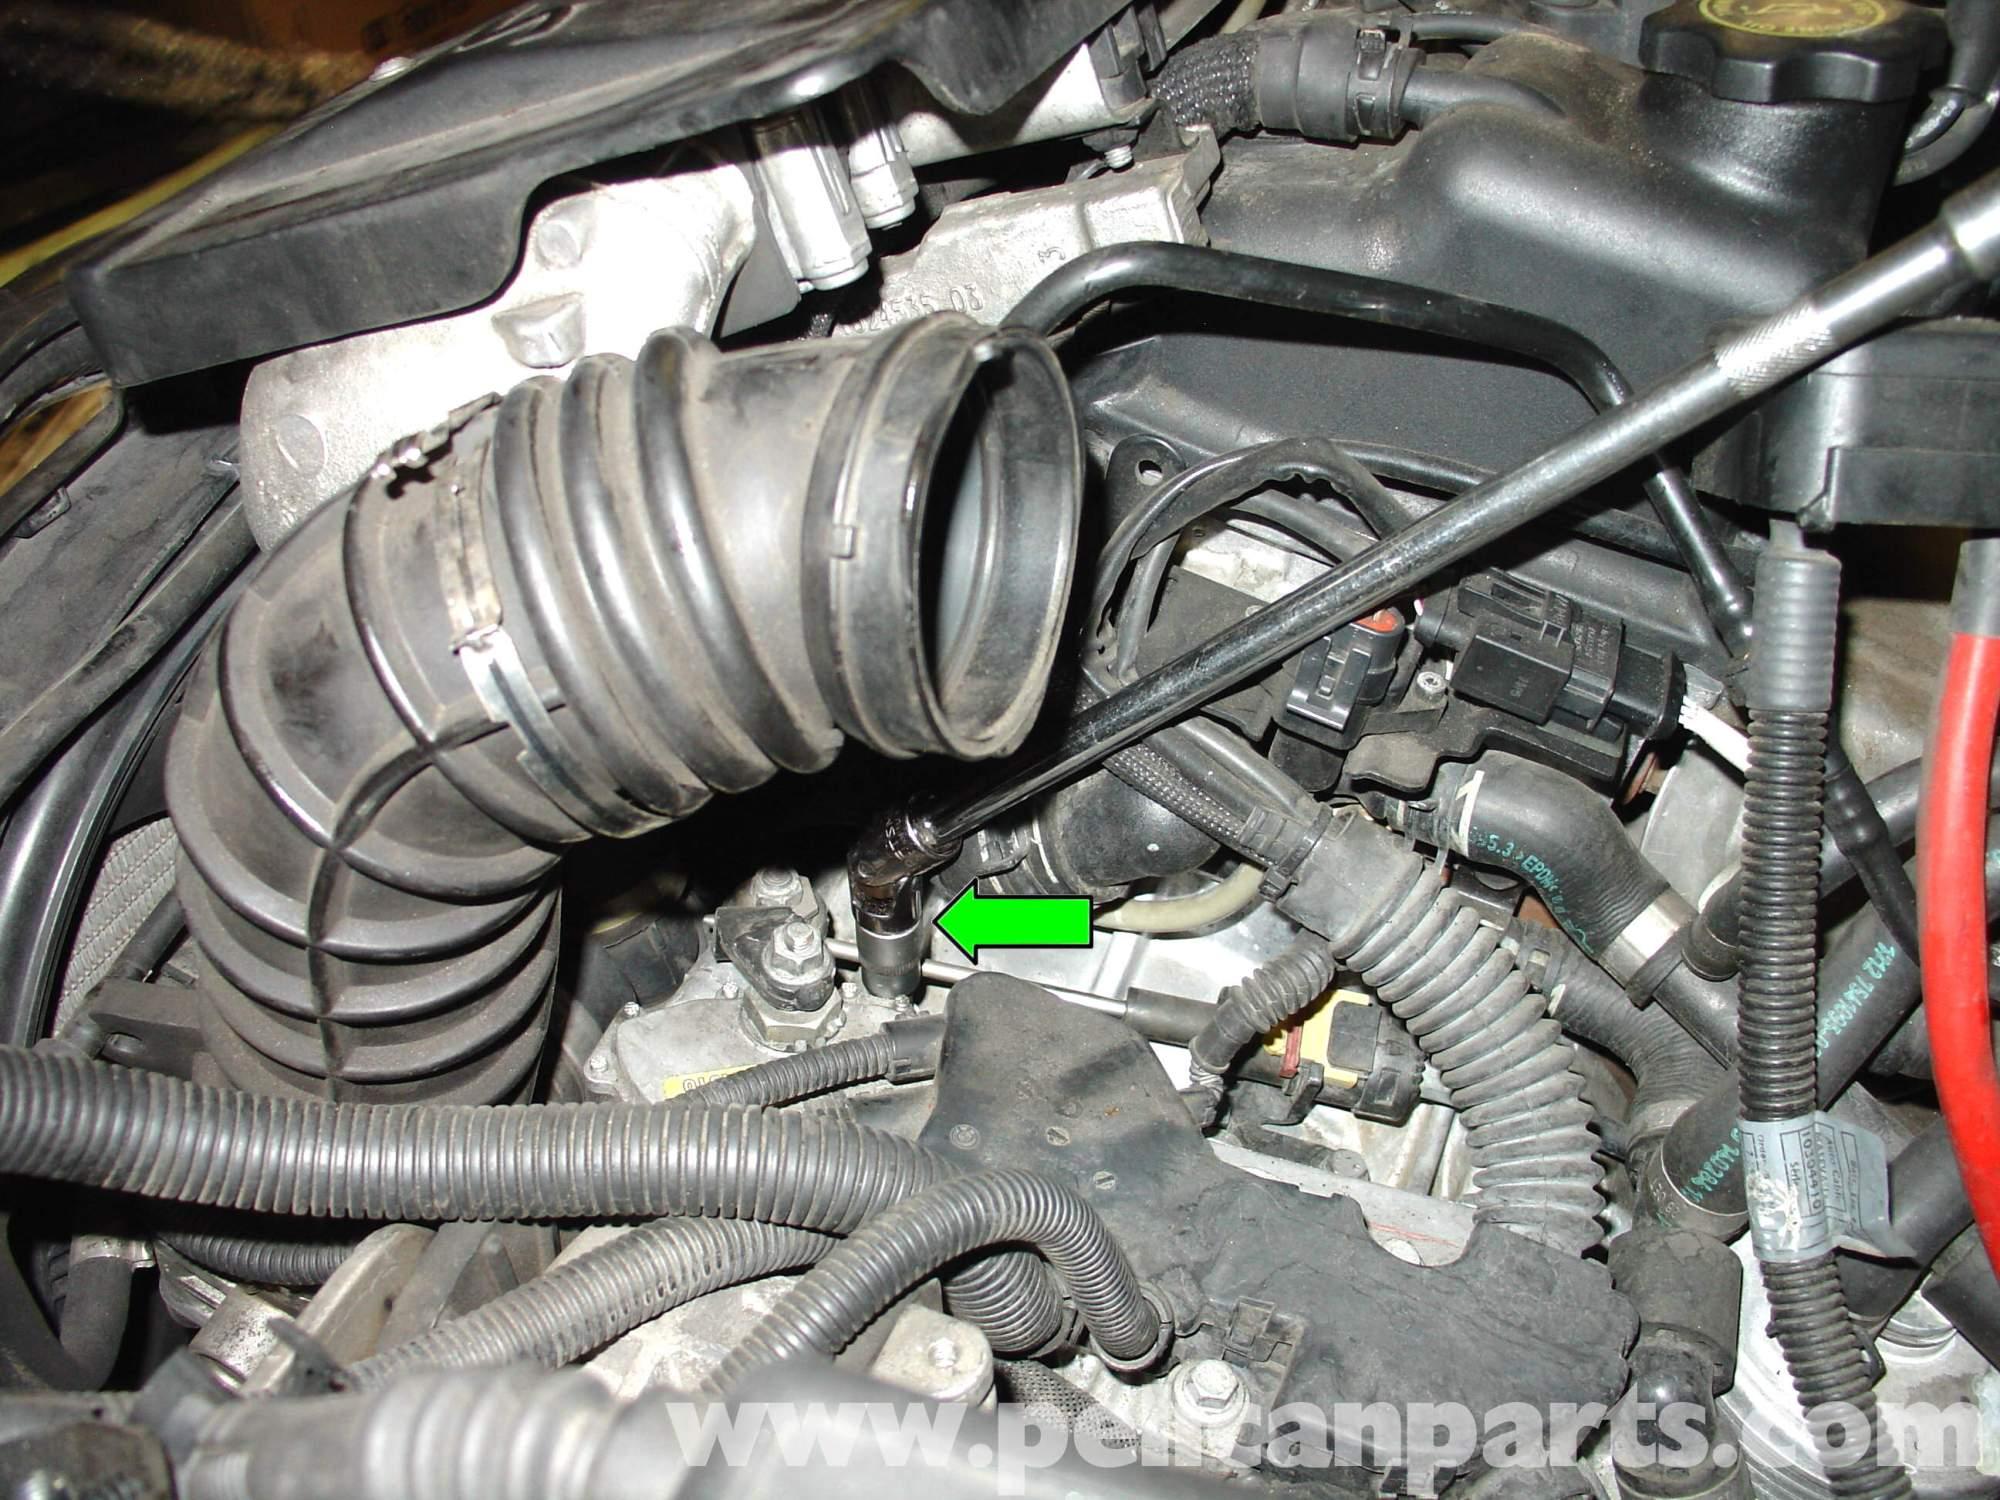 hight resolution of pelican technical article mini cooper automatic transmission 06 mini cooper s engine parts diagram